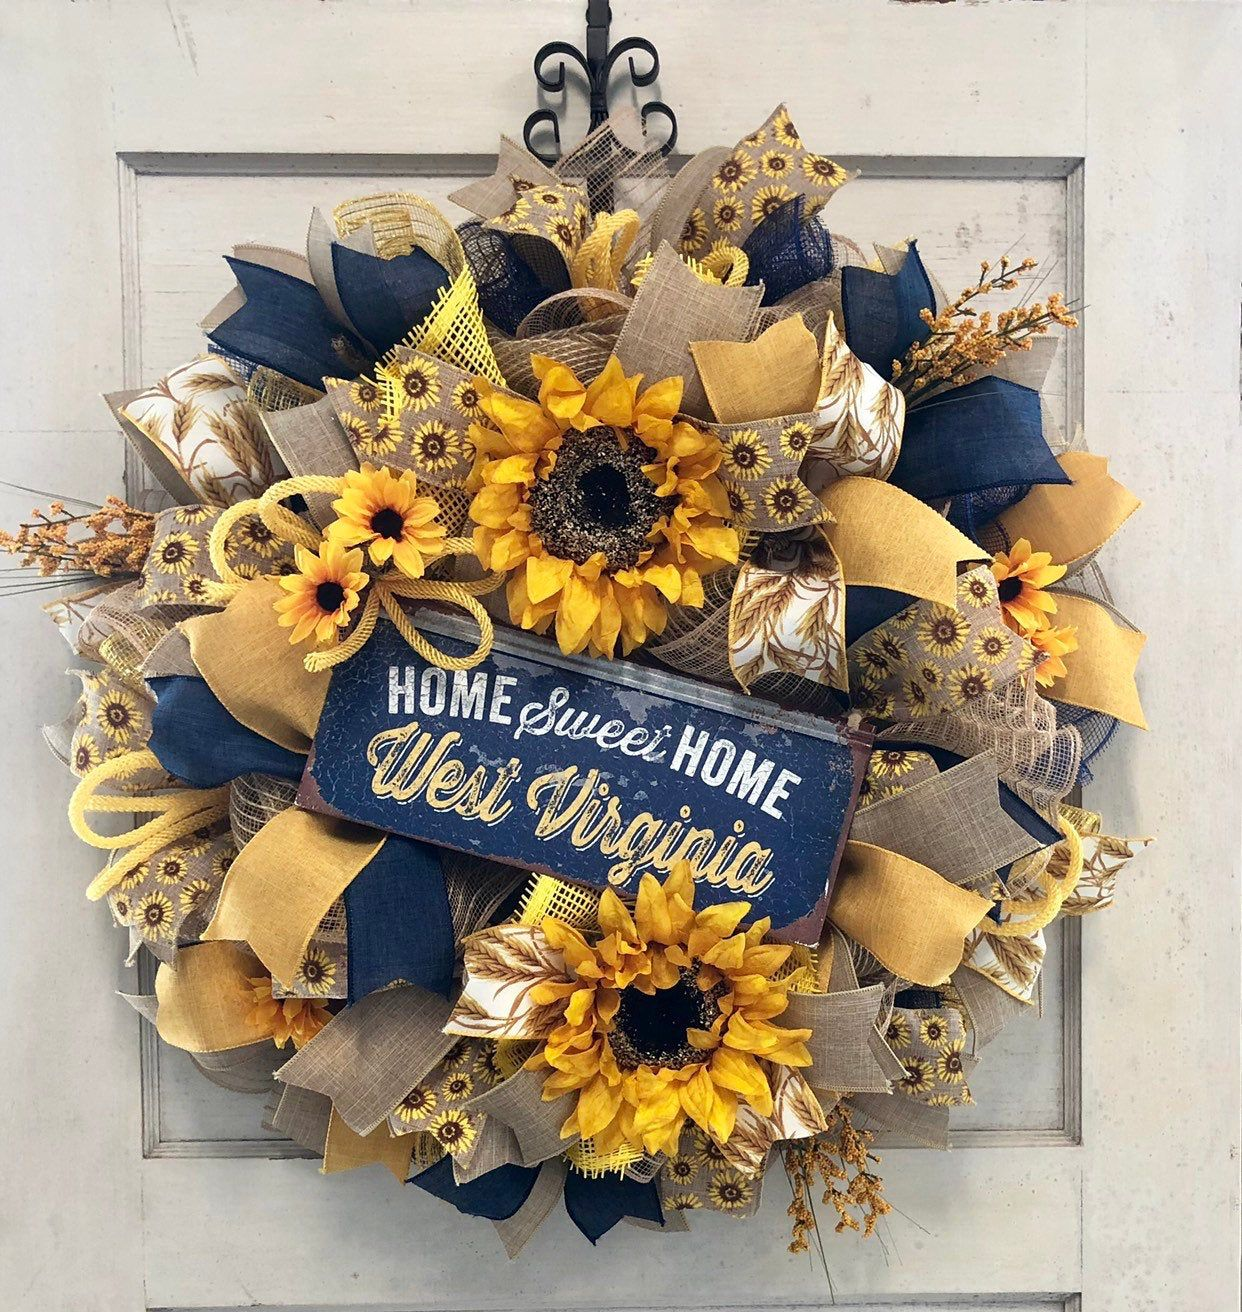 WVU Wreath - West Virginia Wreath - Fall West Virginia Wreath - Mountaineer Wreath - The Whispering Wreath - Home Sweet Home